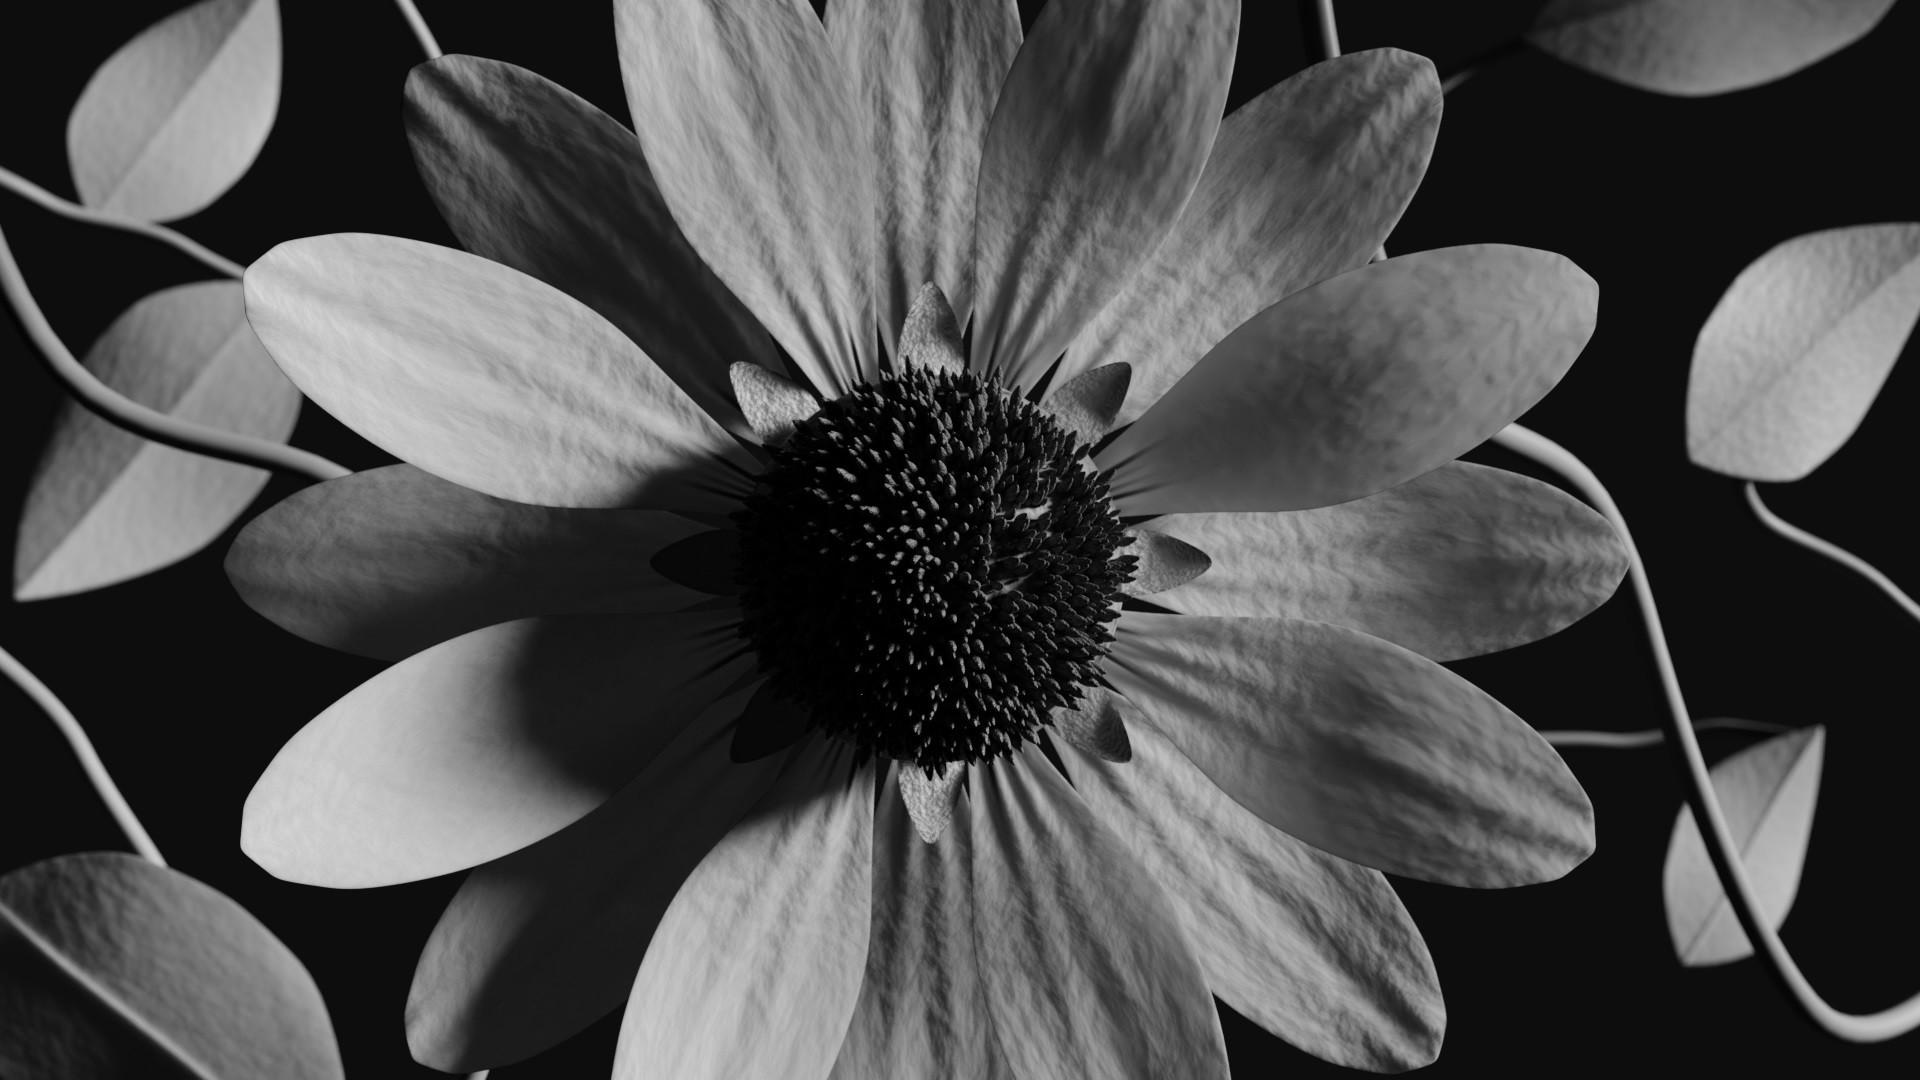 Stephen koehler contrastedflower